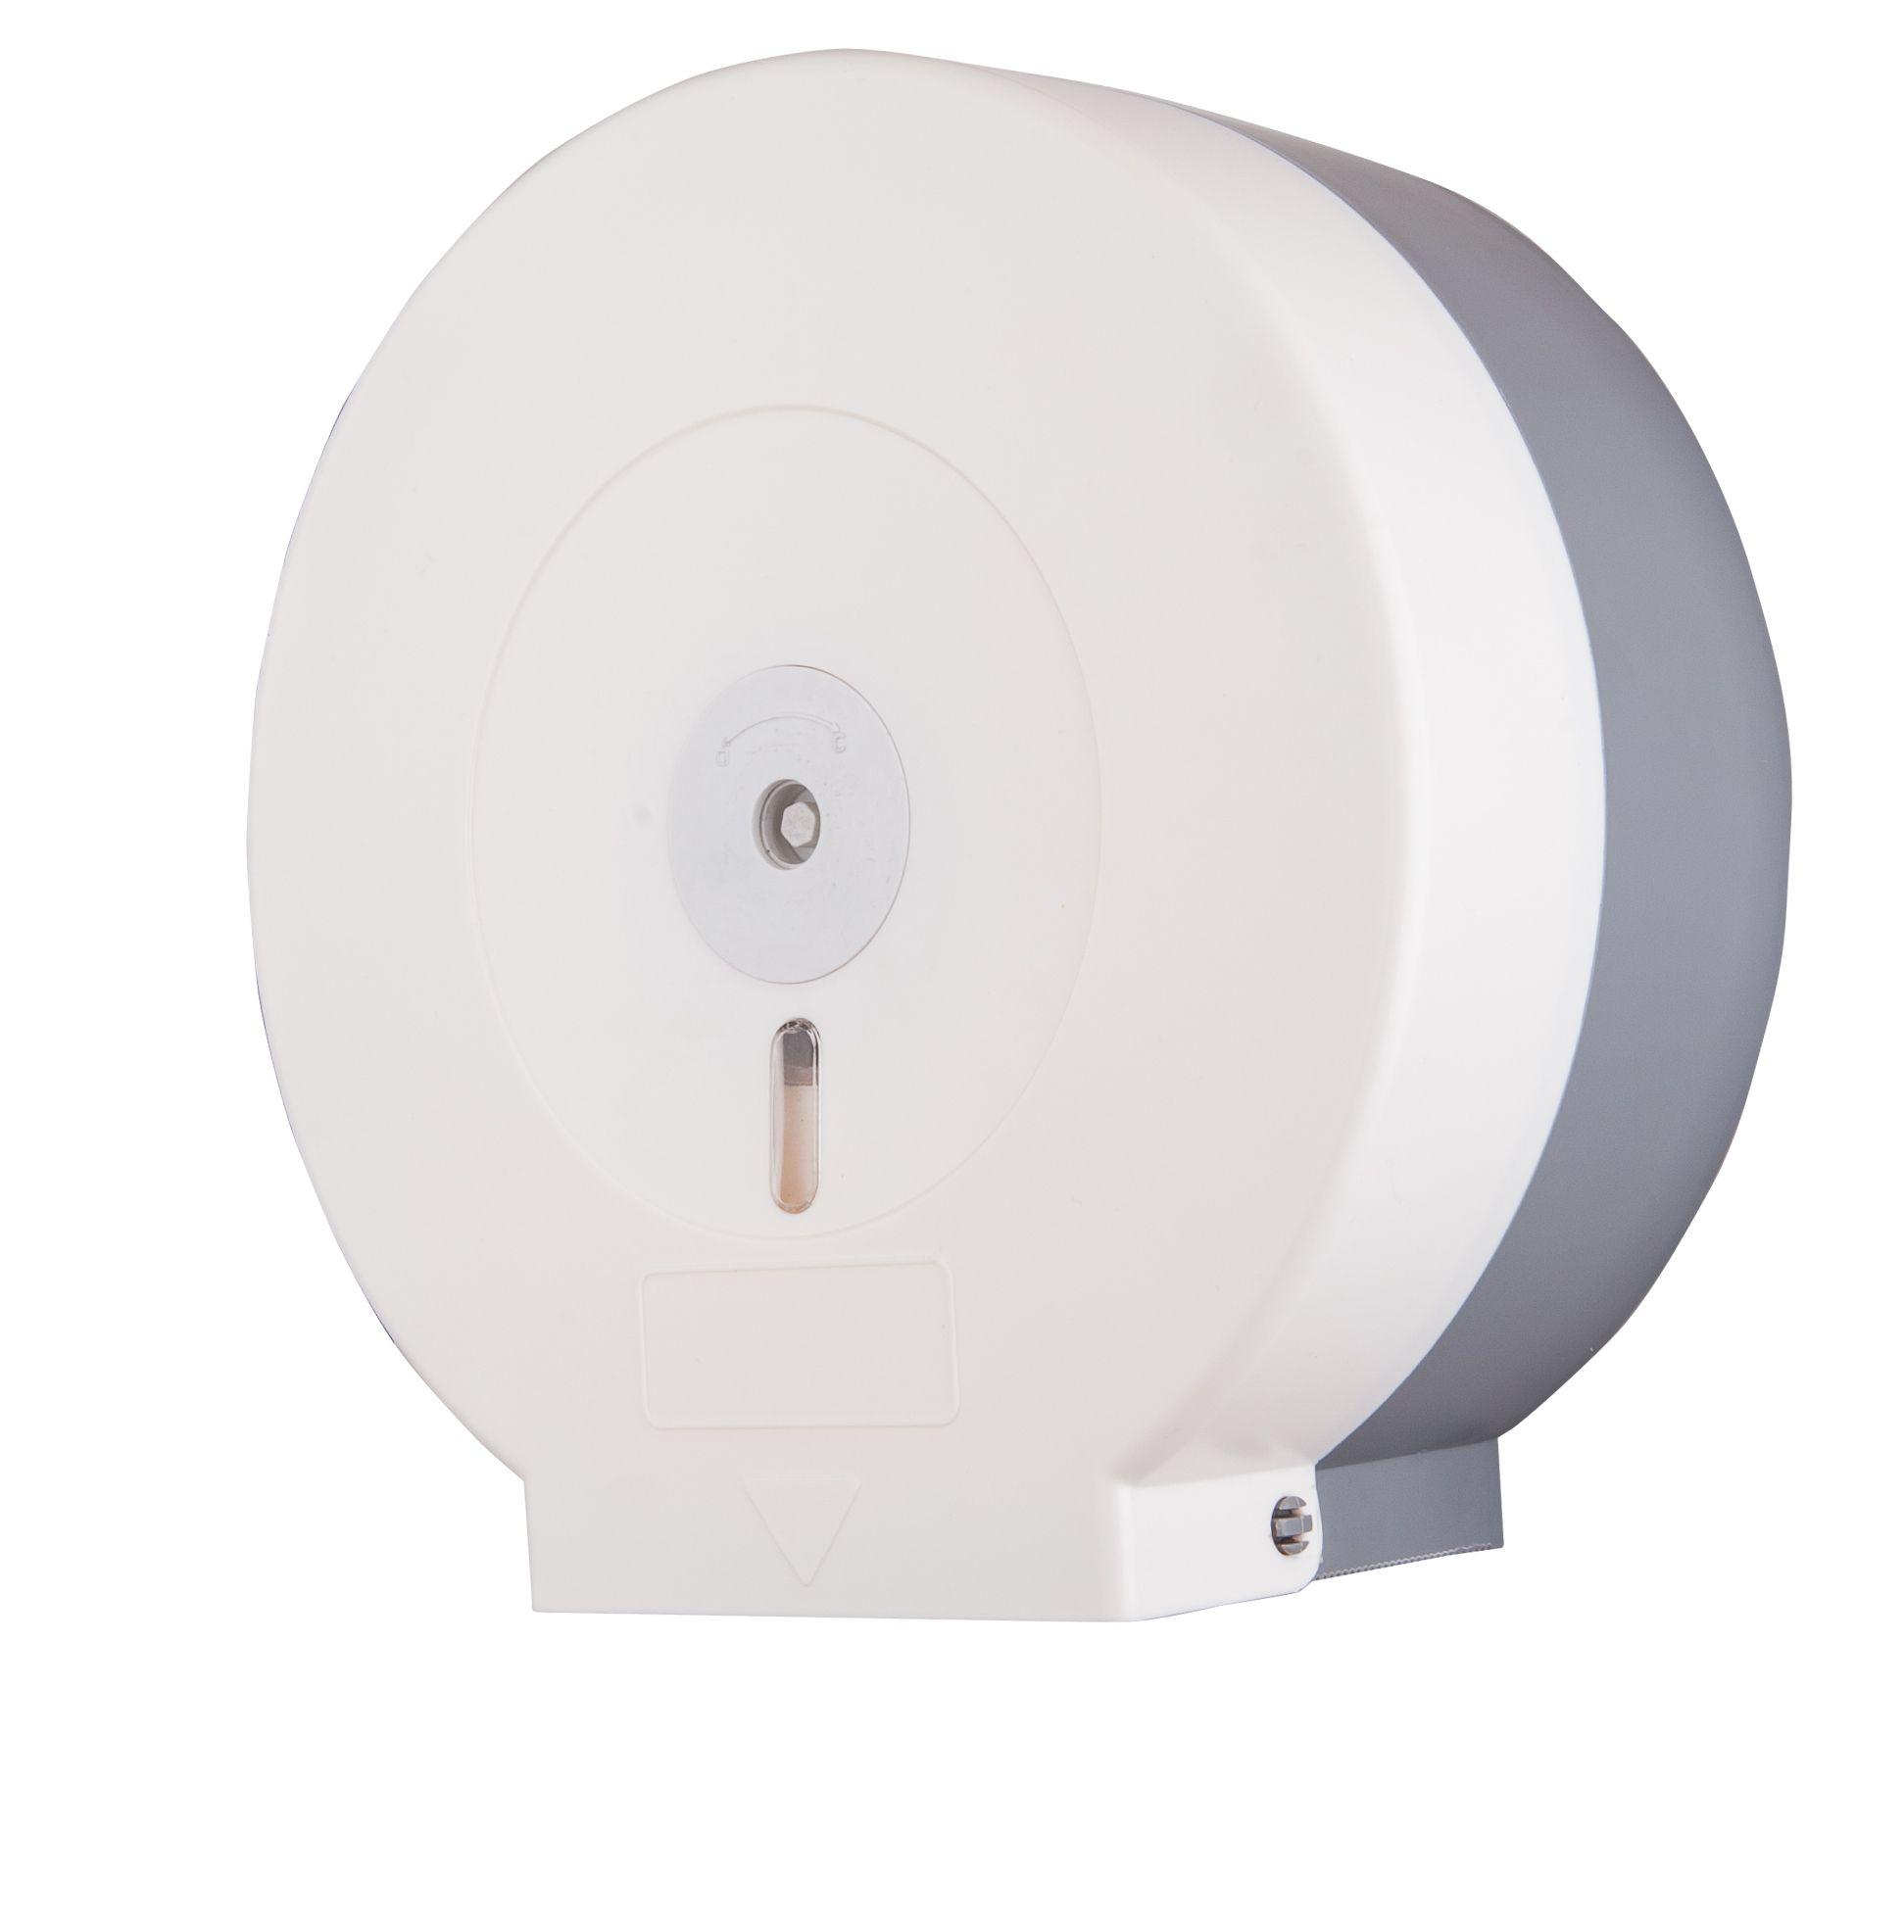 plastic paper holder Buy toilet paper holders products like spare toilet paper holder in white, gatco® recessed toilet paper holder in chrome, taymor® walking dog toilet paper holder.